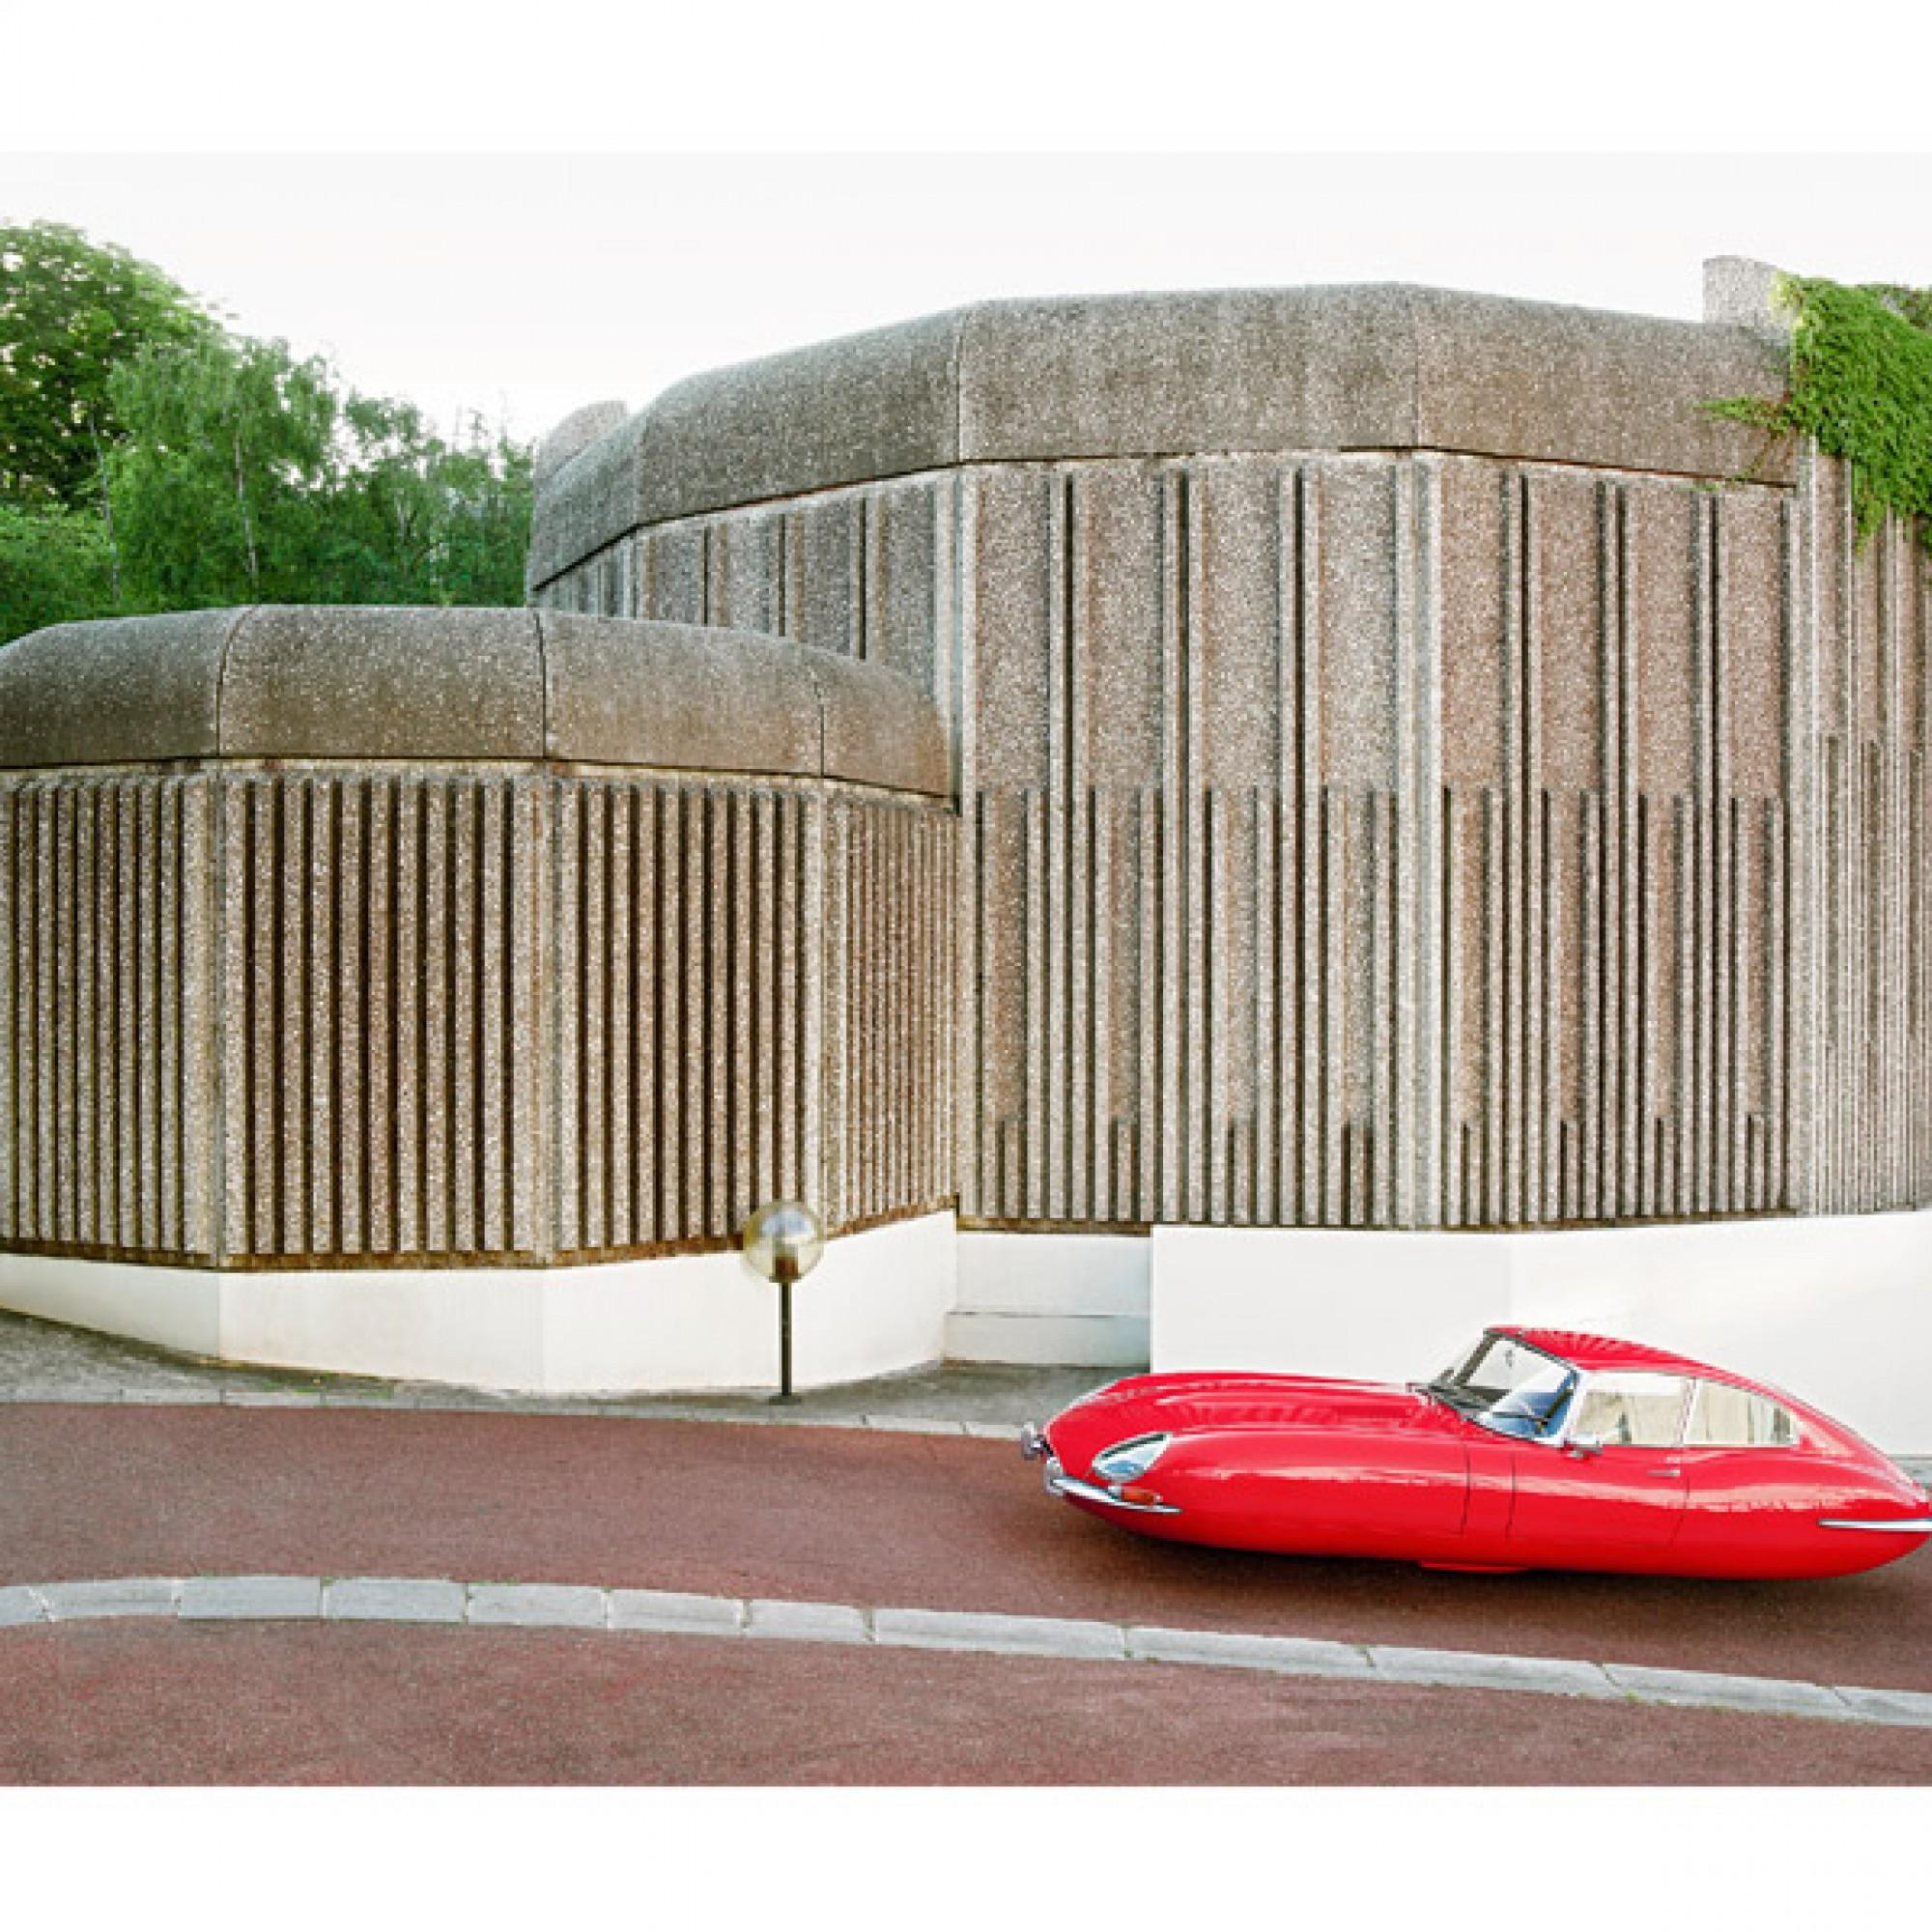 Jaguar Type E. (Renaud Marion / M.A.D. Gallery / zvg)